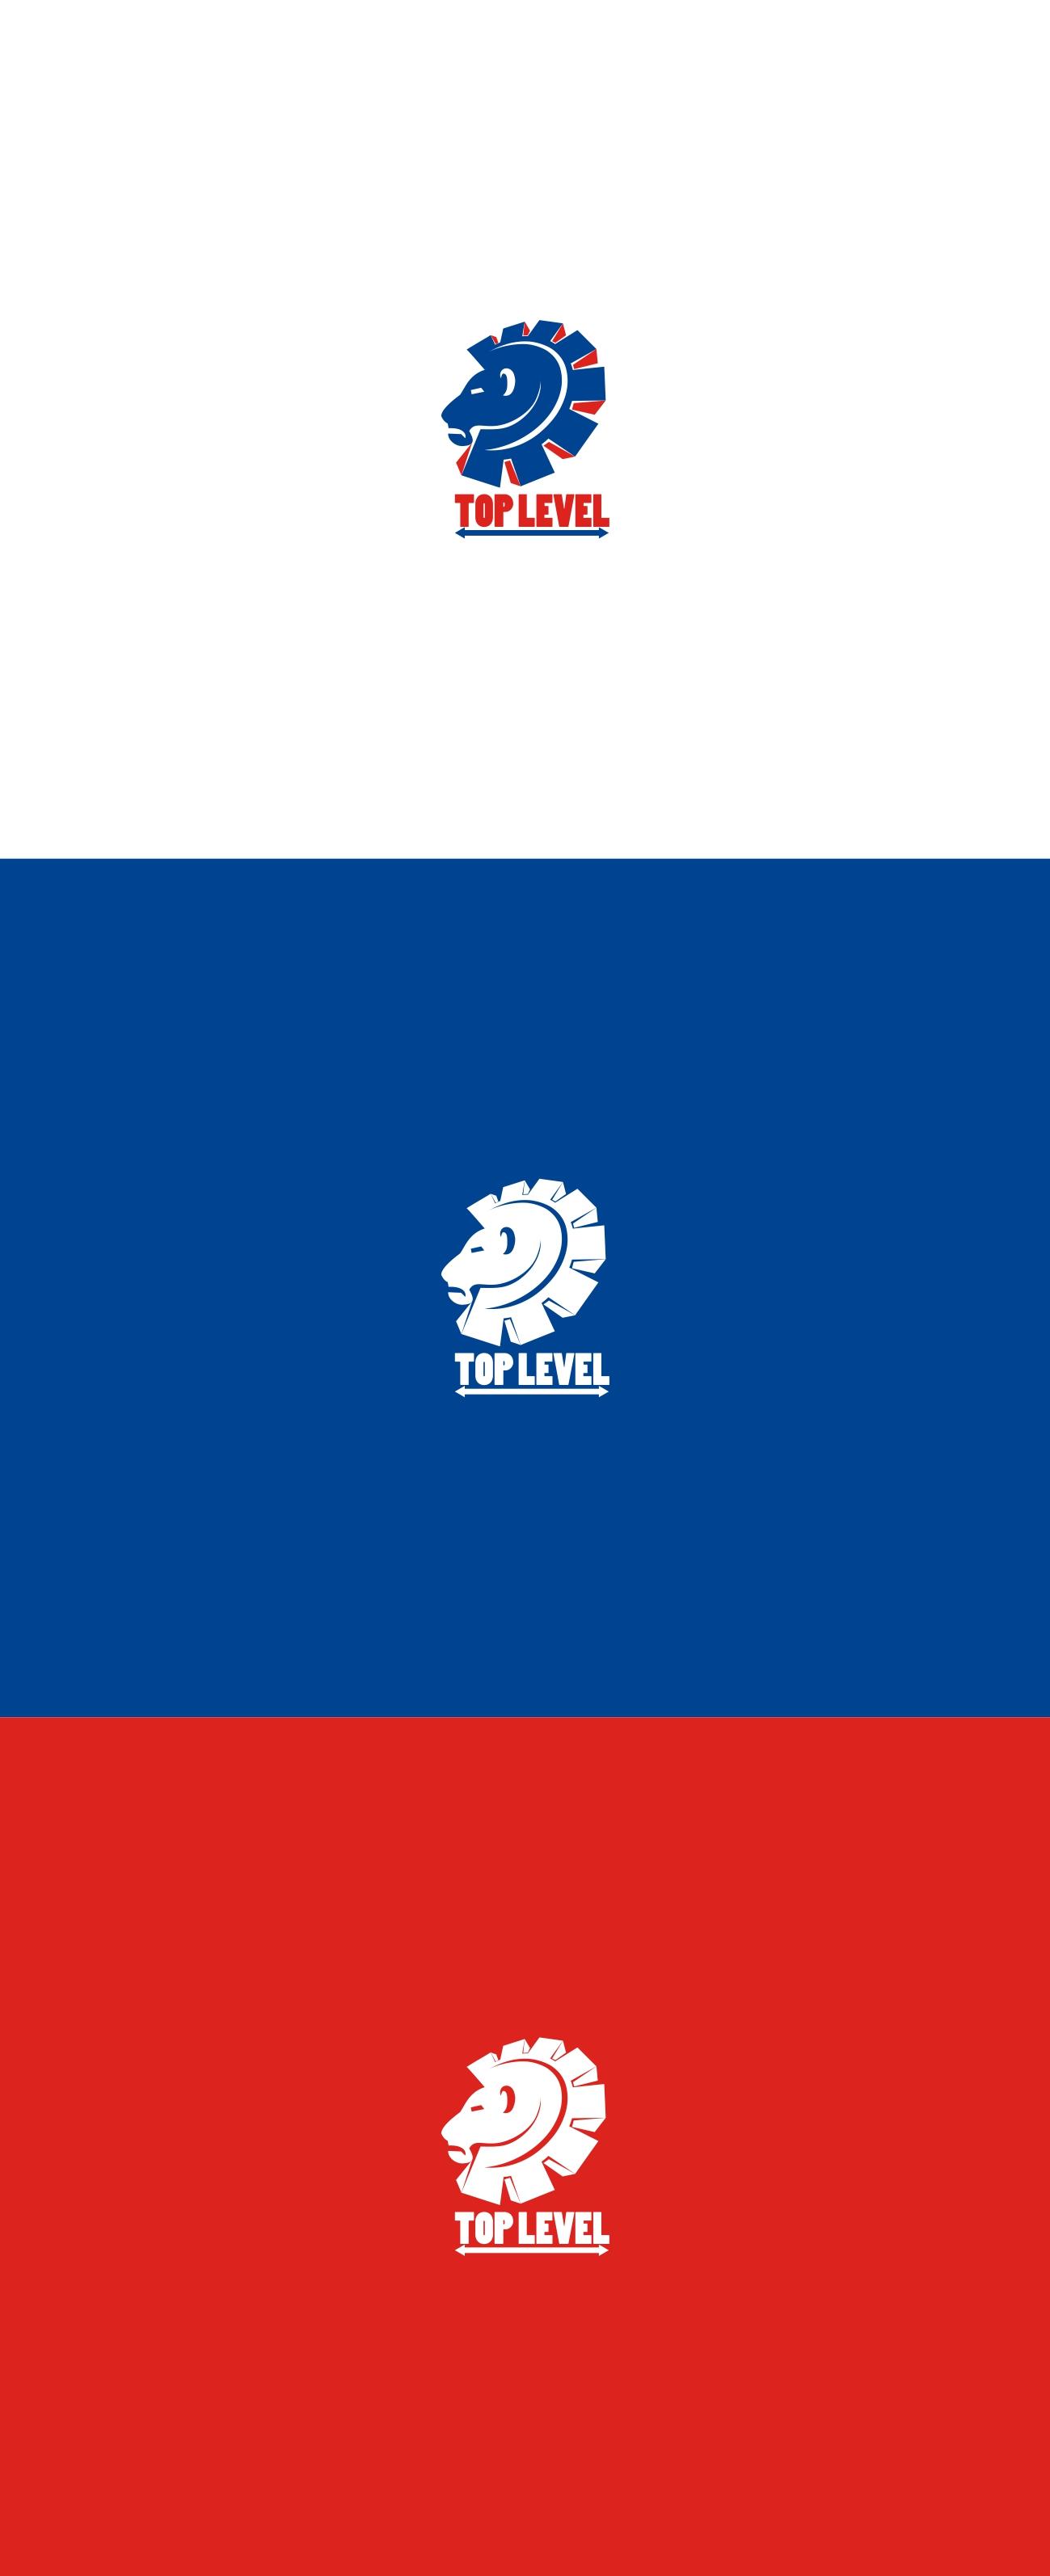 Разработка логотипа для тюнинг ателье фото f_2645f47b35c1a7b1.jpg